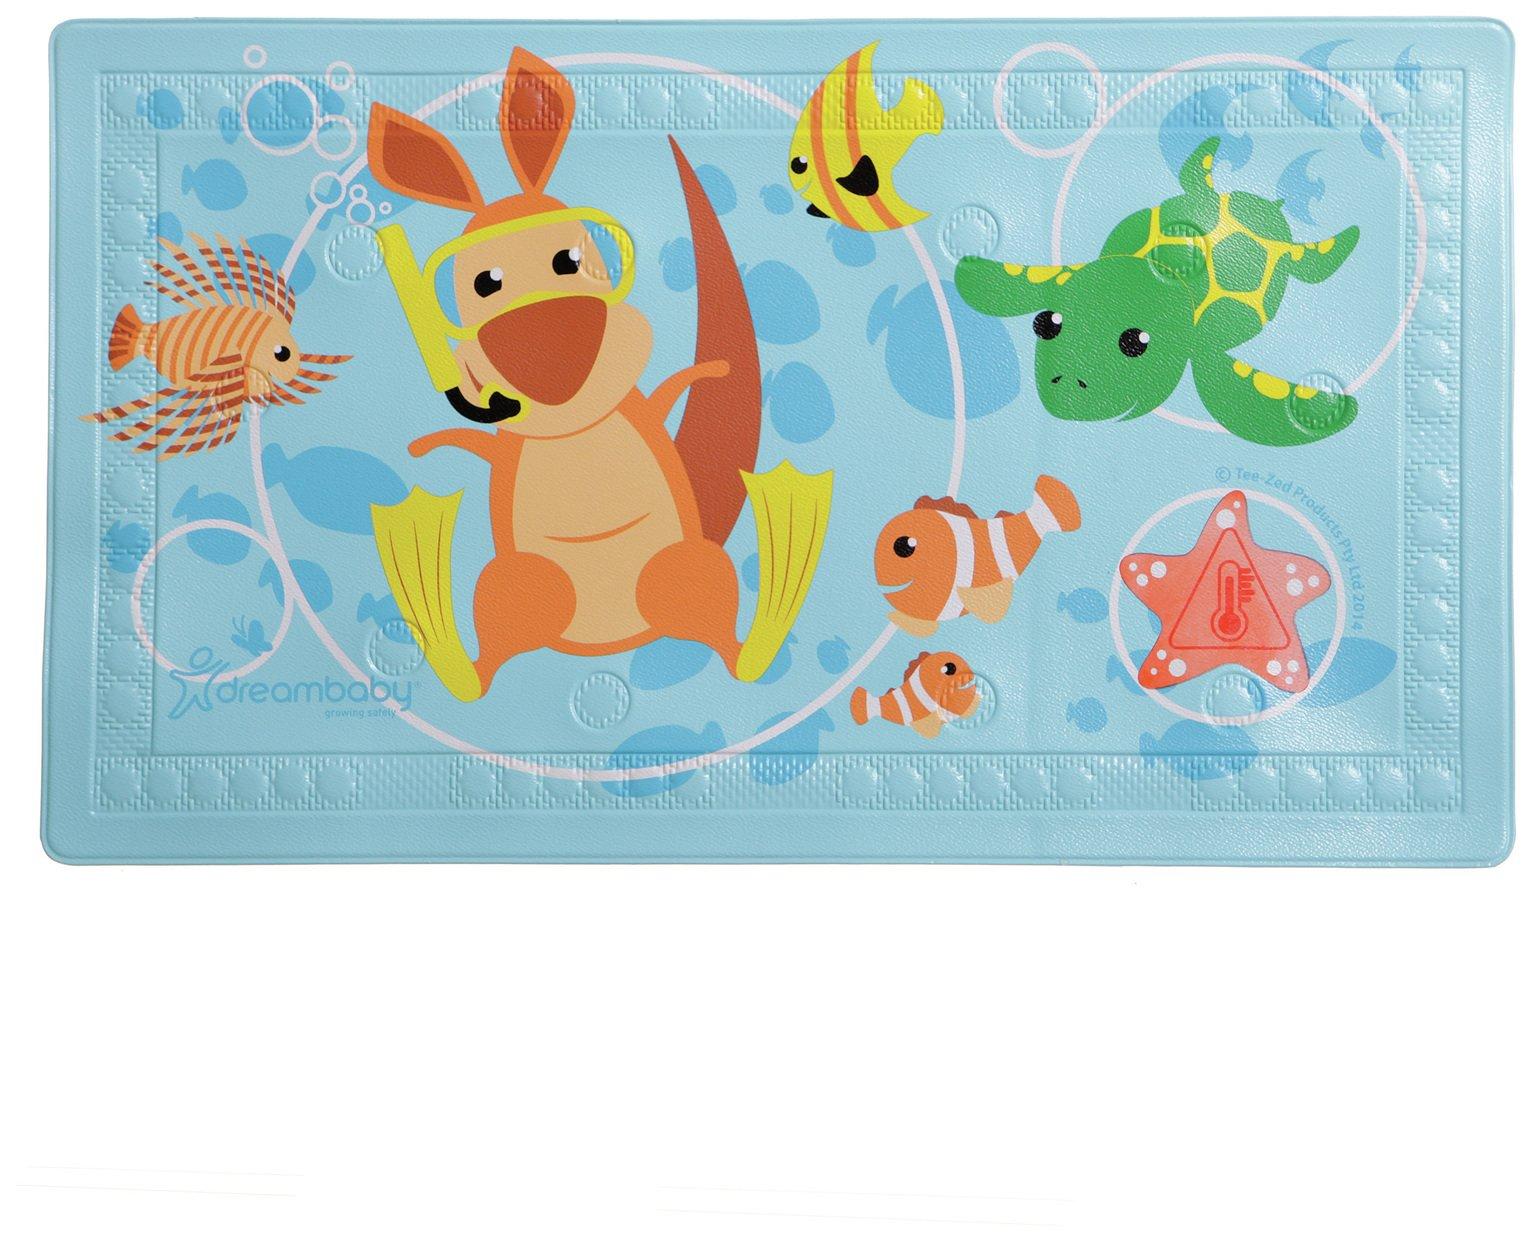 Dreambaby Anti-Slip Large Bath Mat - Heat-Sensing Indicator